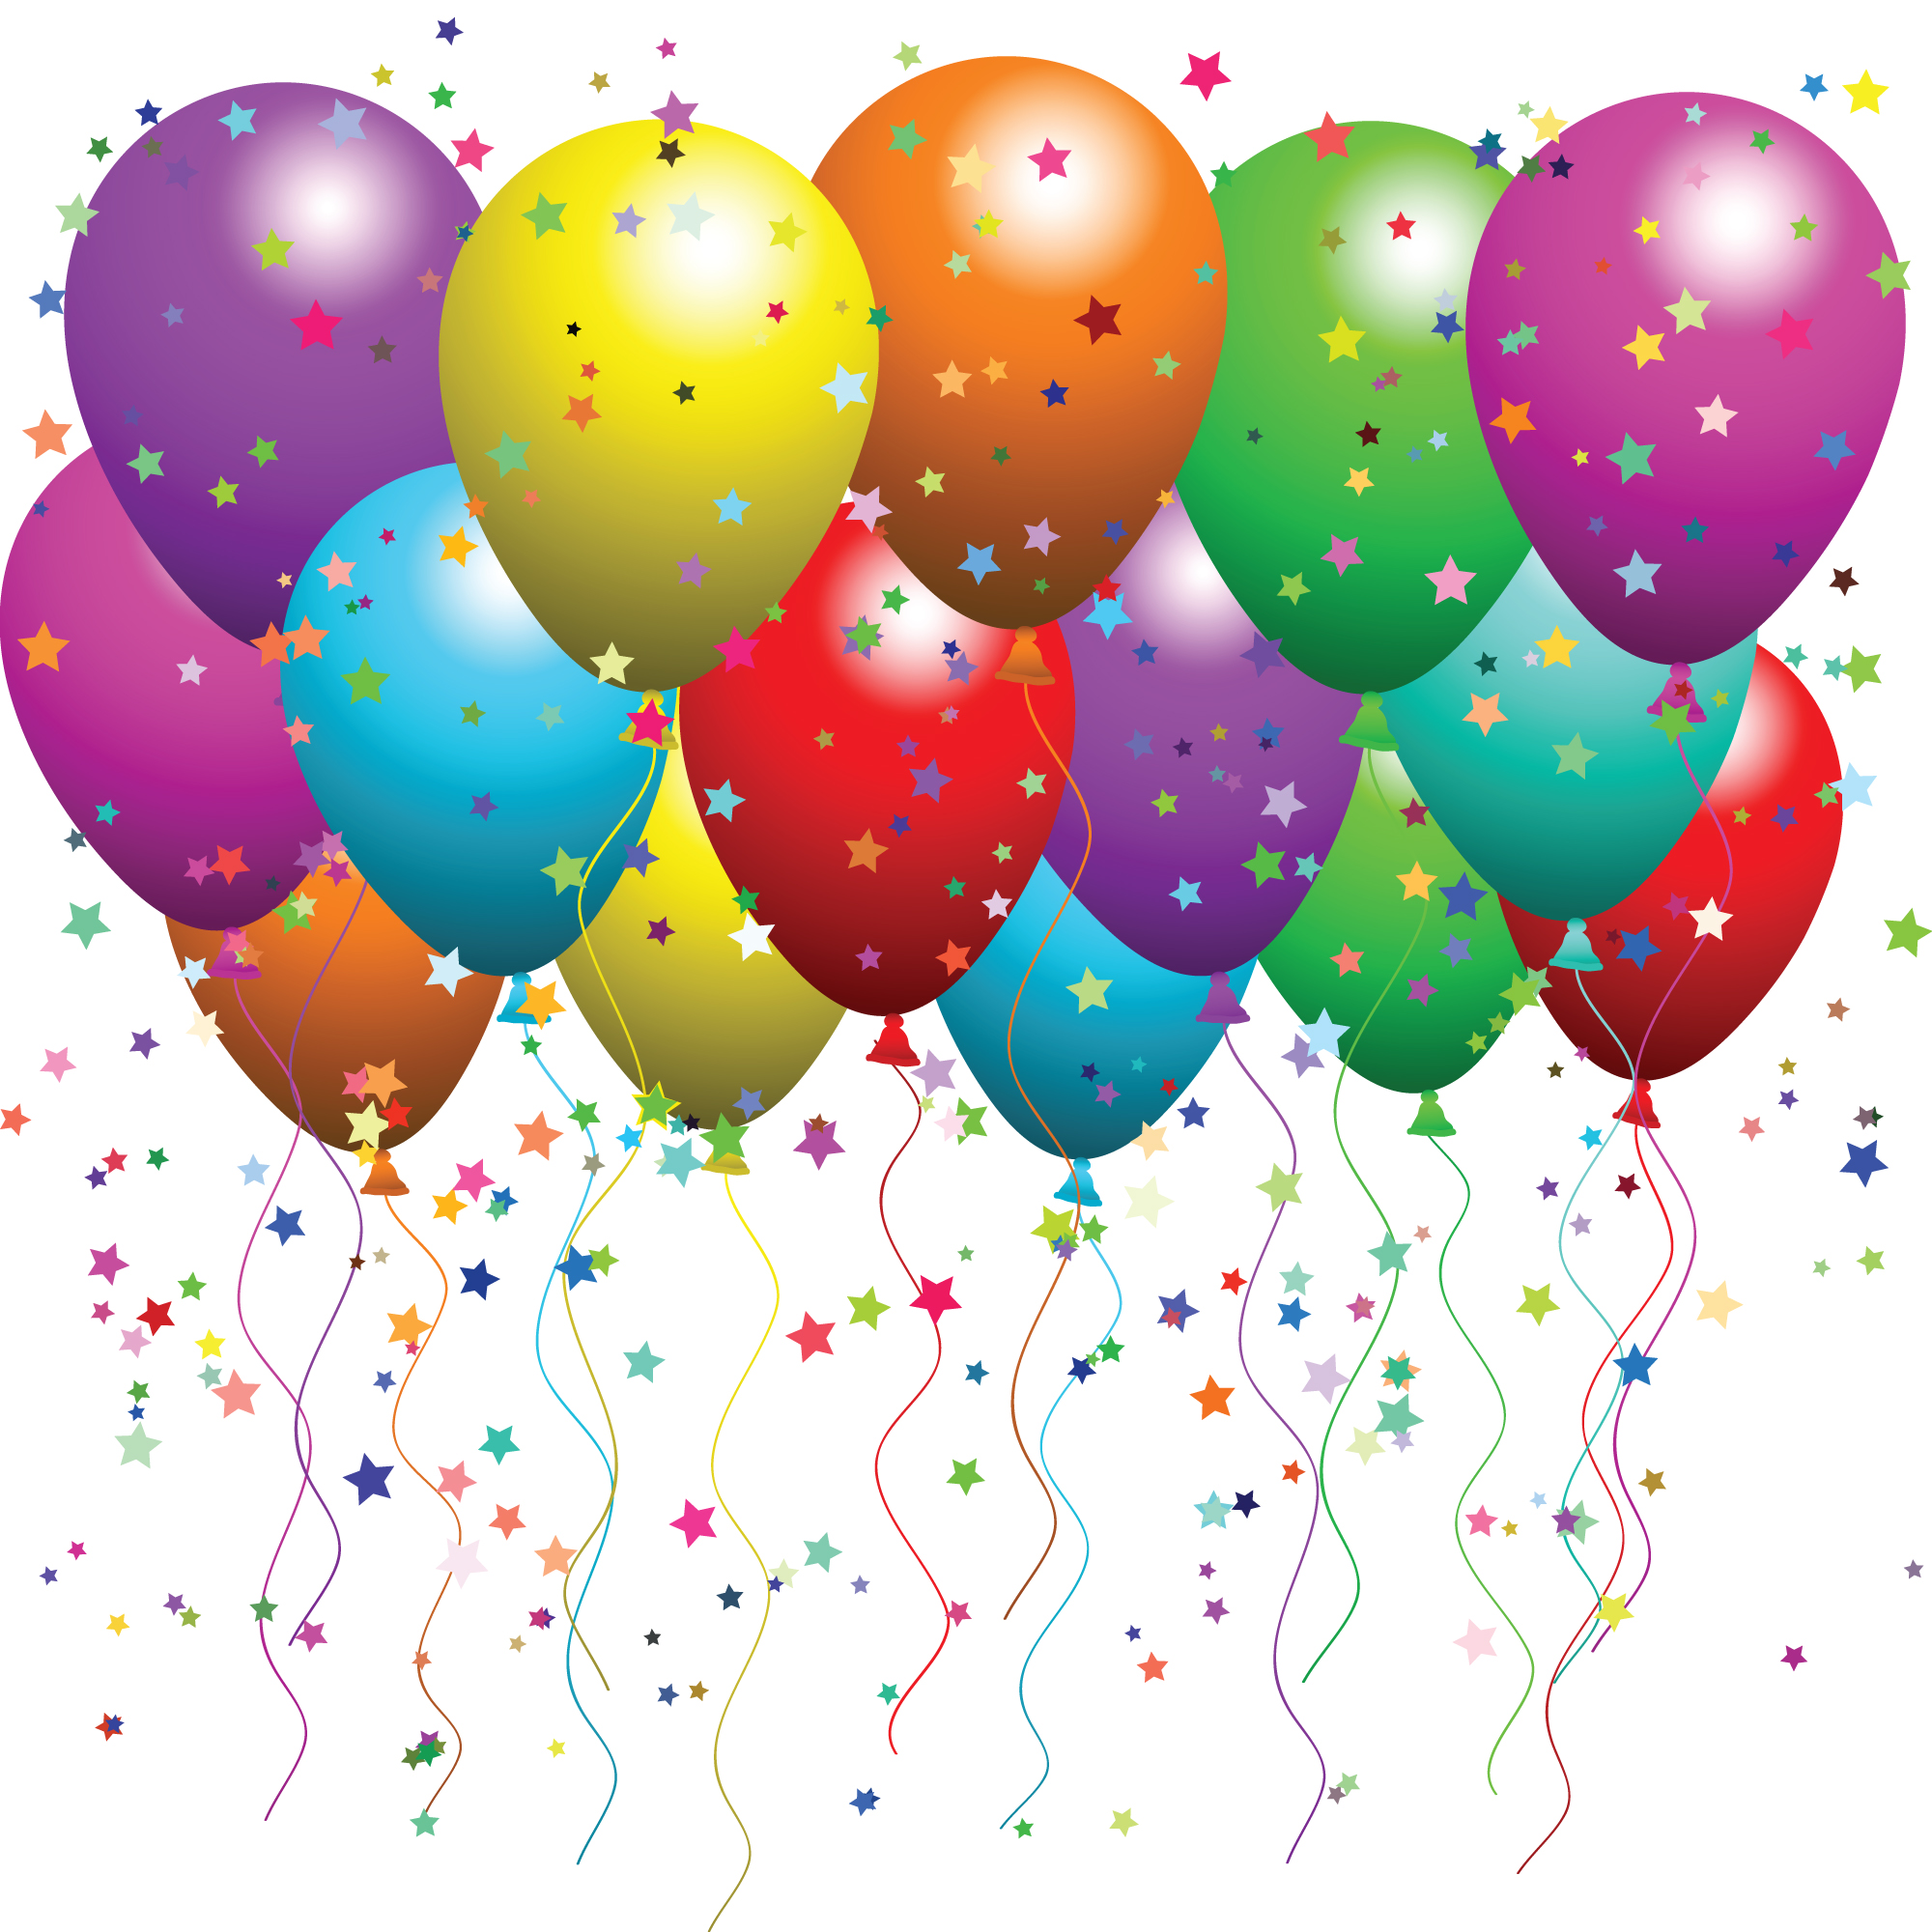 balloons celebration wallpaper - photo #38